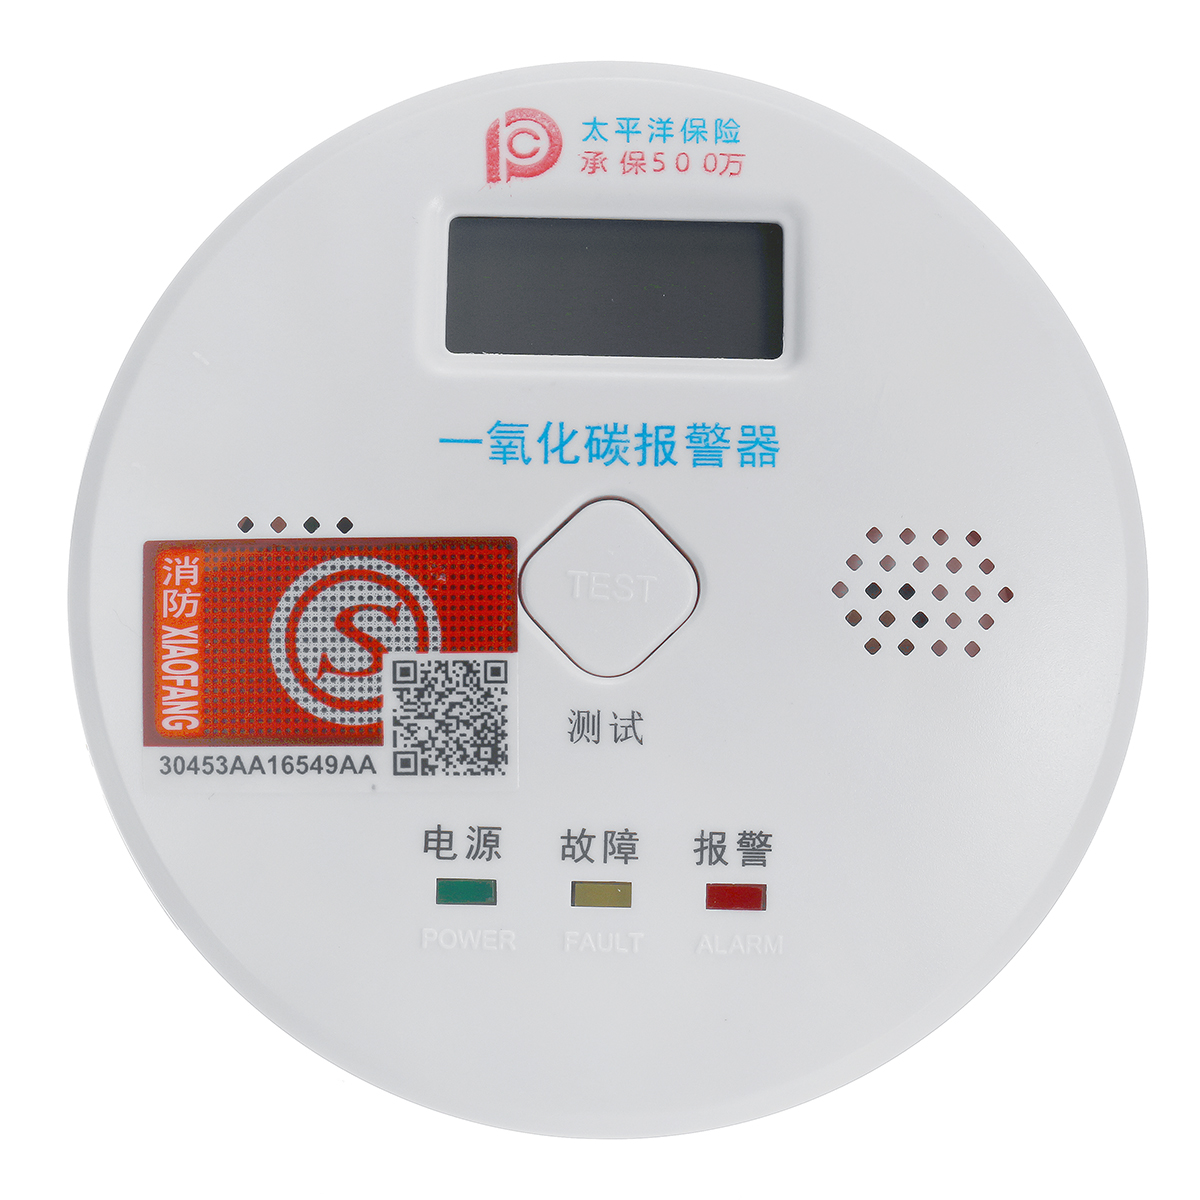 Co Carbon Monoxide Smoke Alarm 2 In 1 Integrated Detector